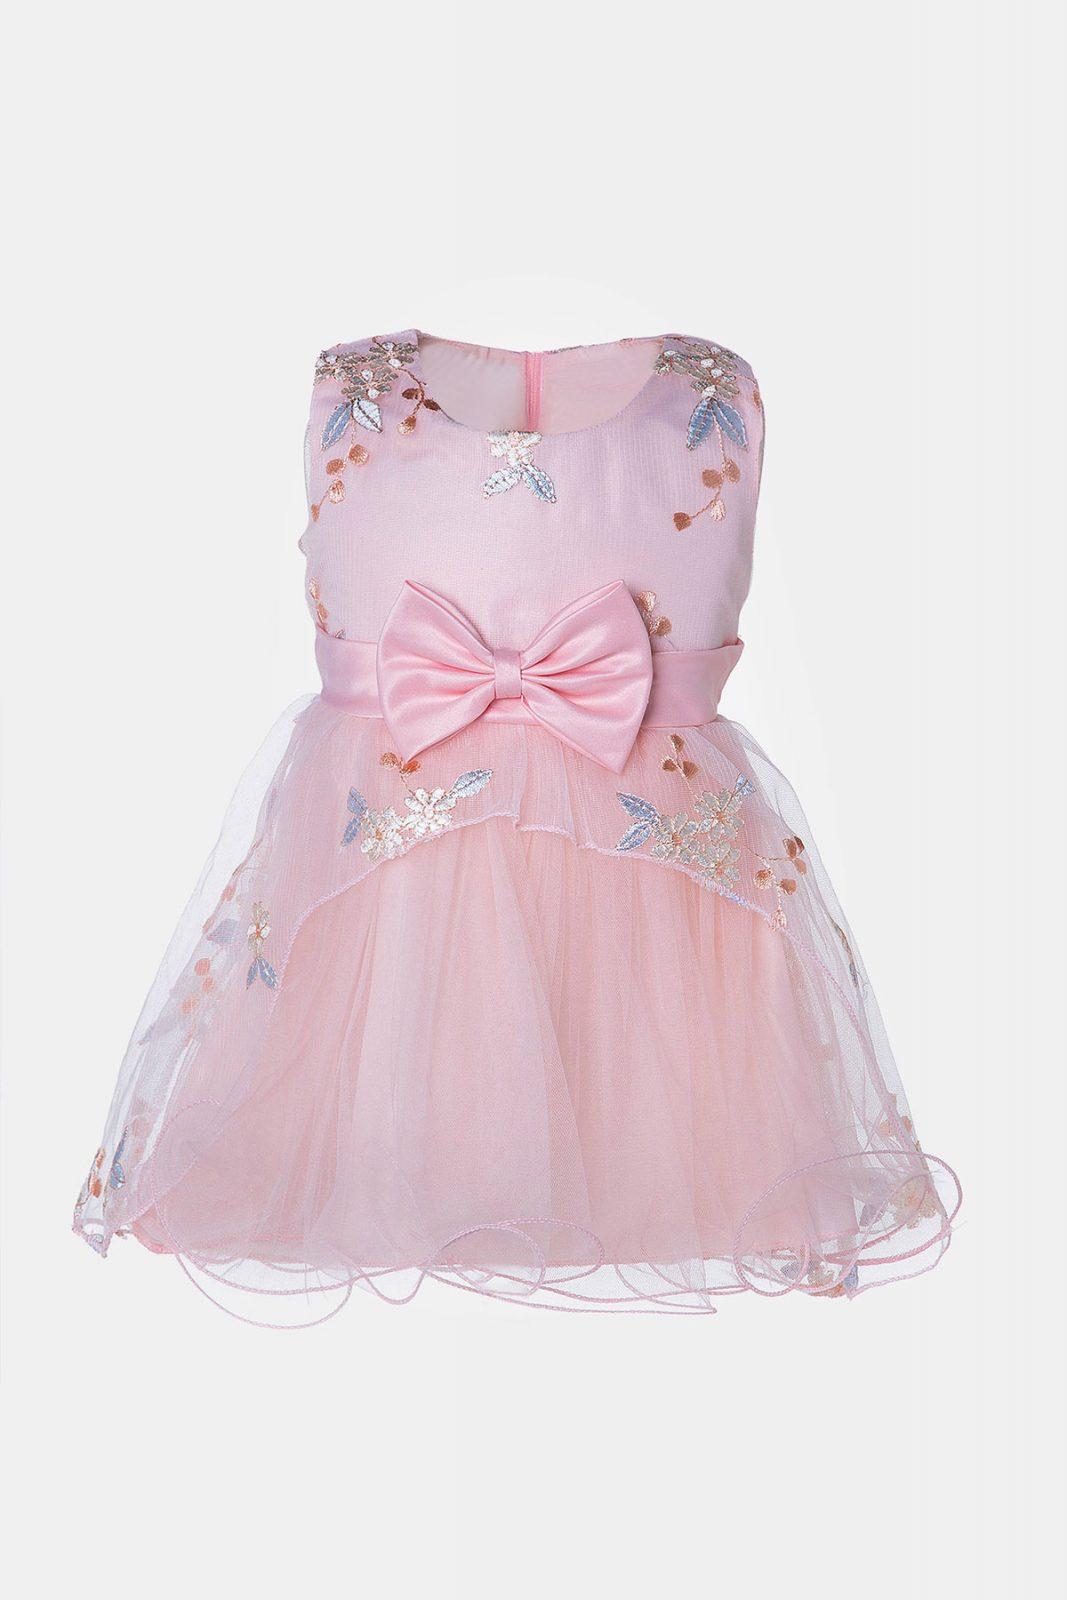 6d3b74f6aee9 Βρεφικό φόρεμα με τούλι σε ροζ χρώμα με ροζ φιόγκο